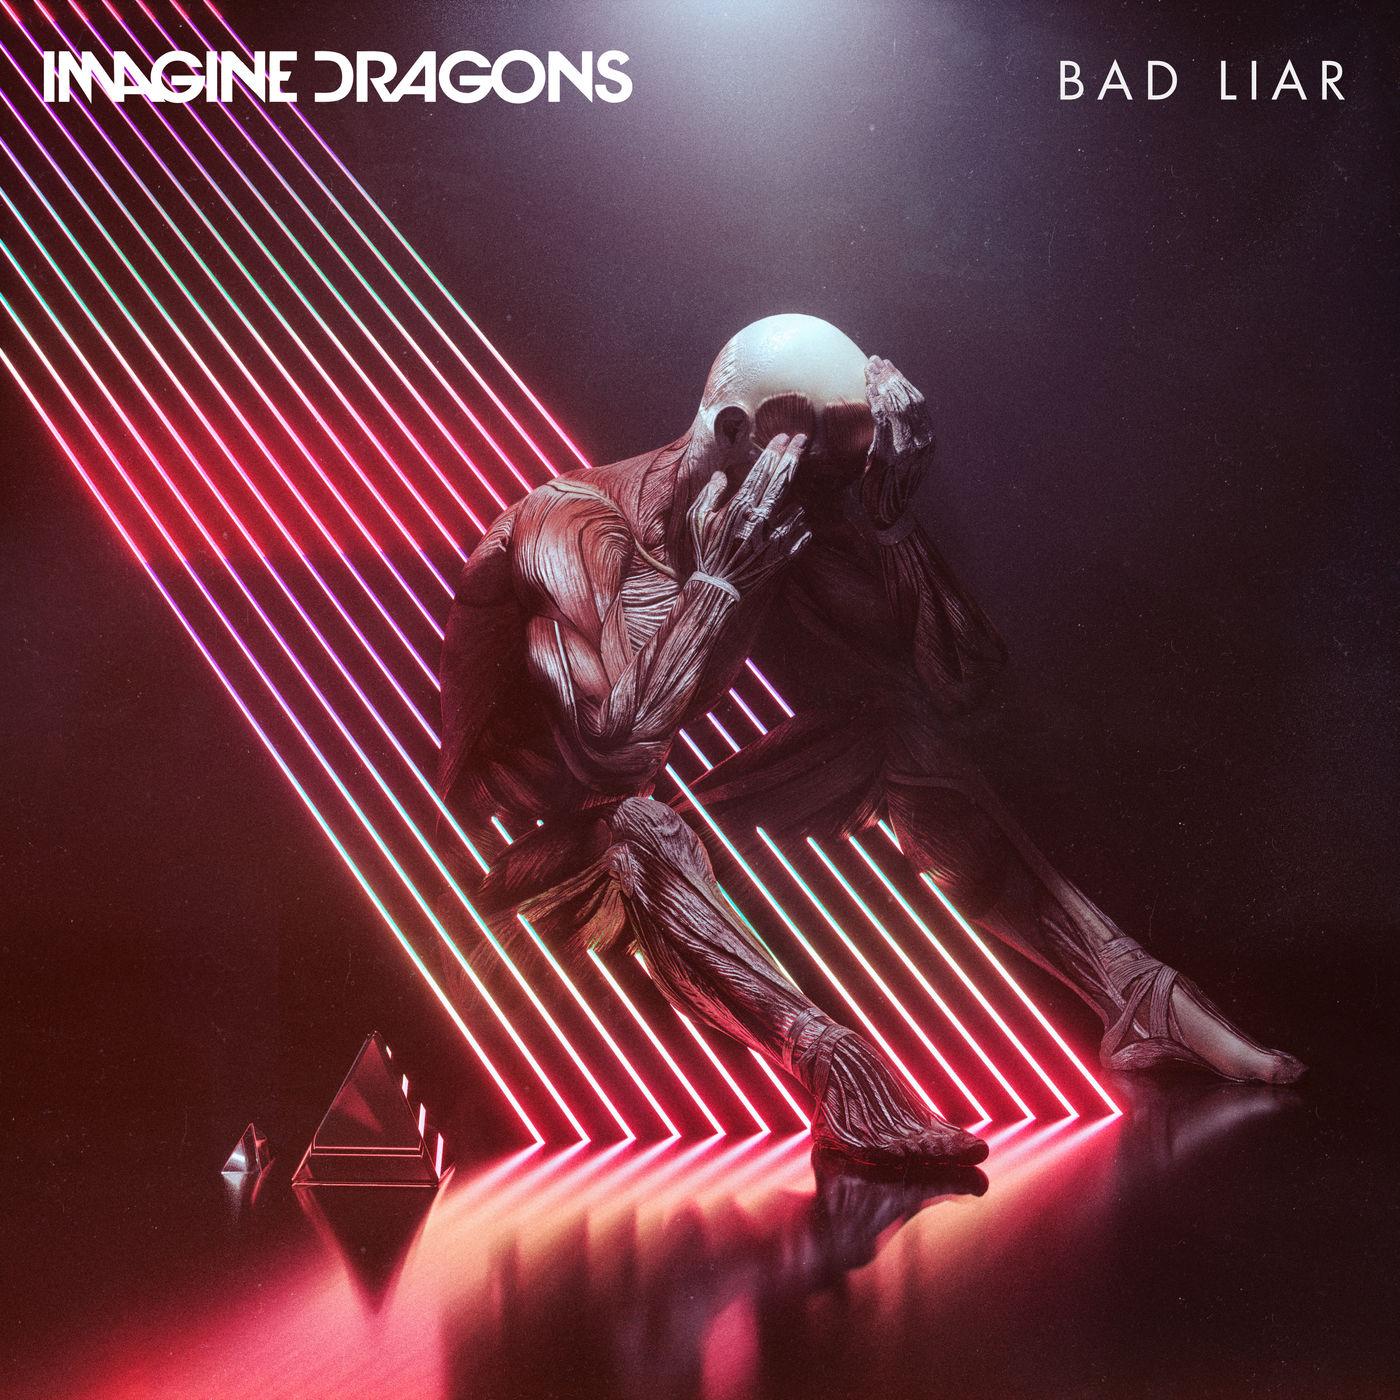 Download Next To Me Imagine Dragon Wapka: DOWNLOAD: Imagine Dragons